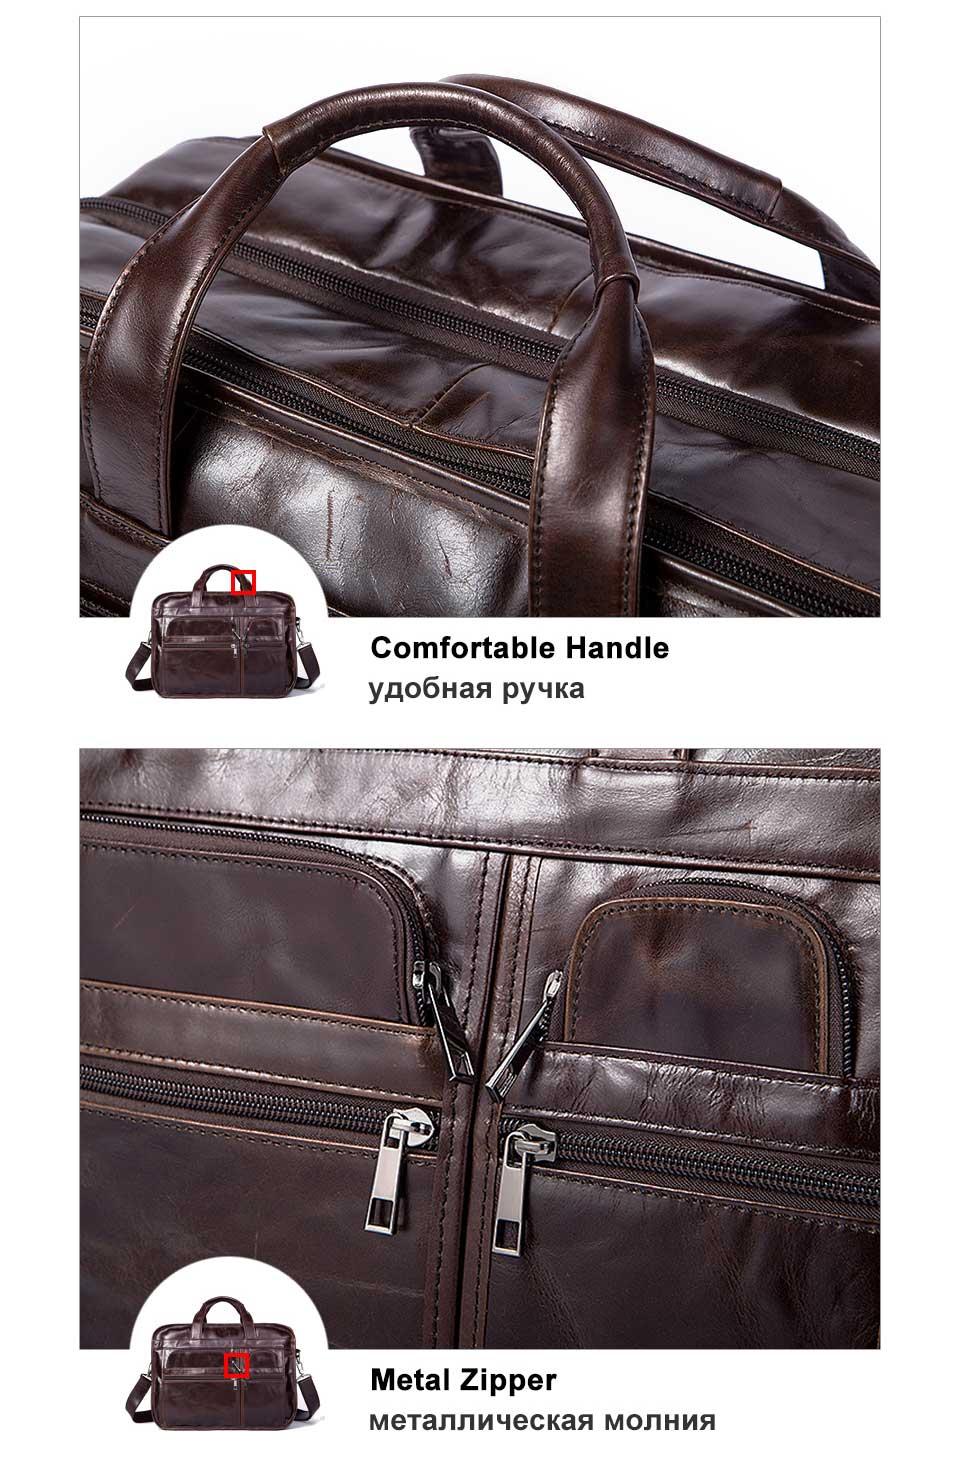 HTB1IMirg0zJ8KJjSspkq6zF7VXao WESTAL men's genuine leather bag for men's briefcase office bags for men leather laptop bag document business briefcase handbag